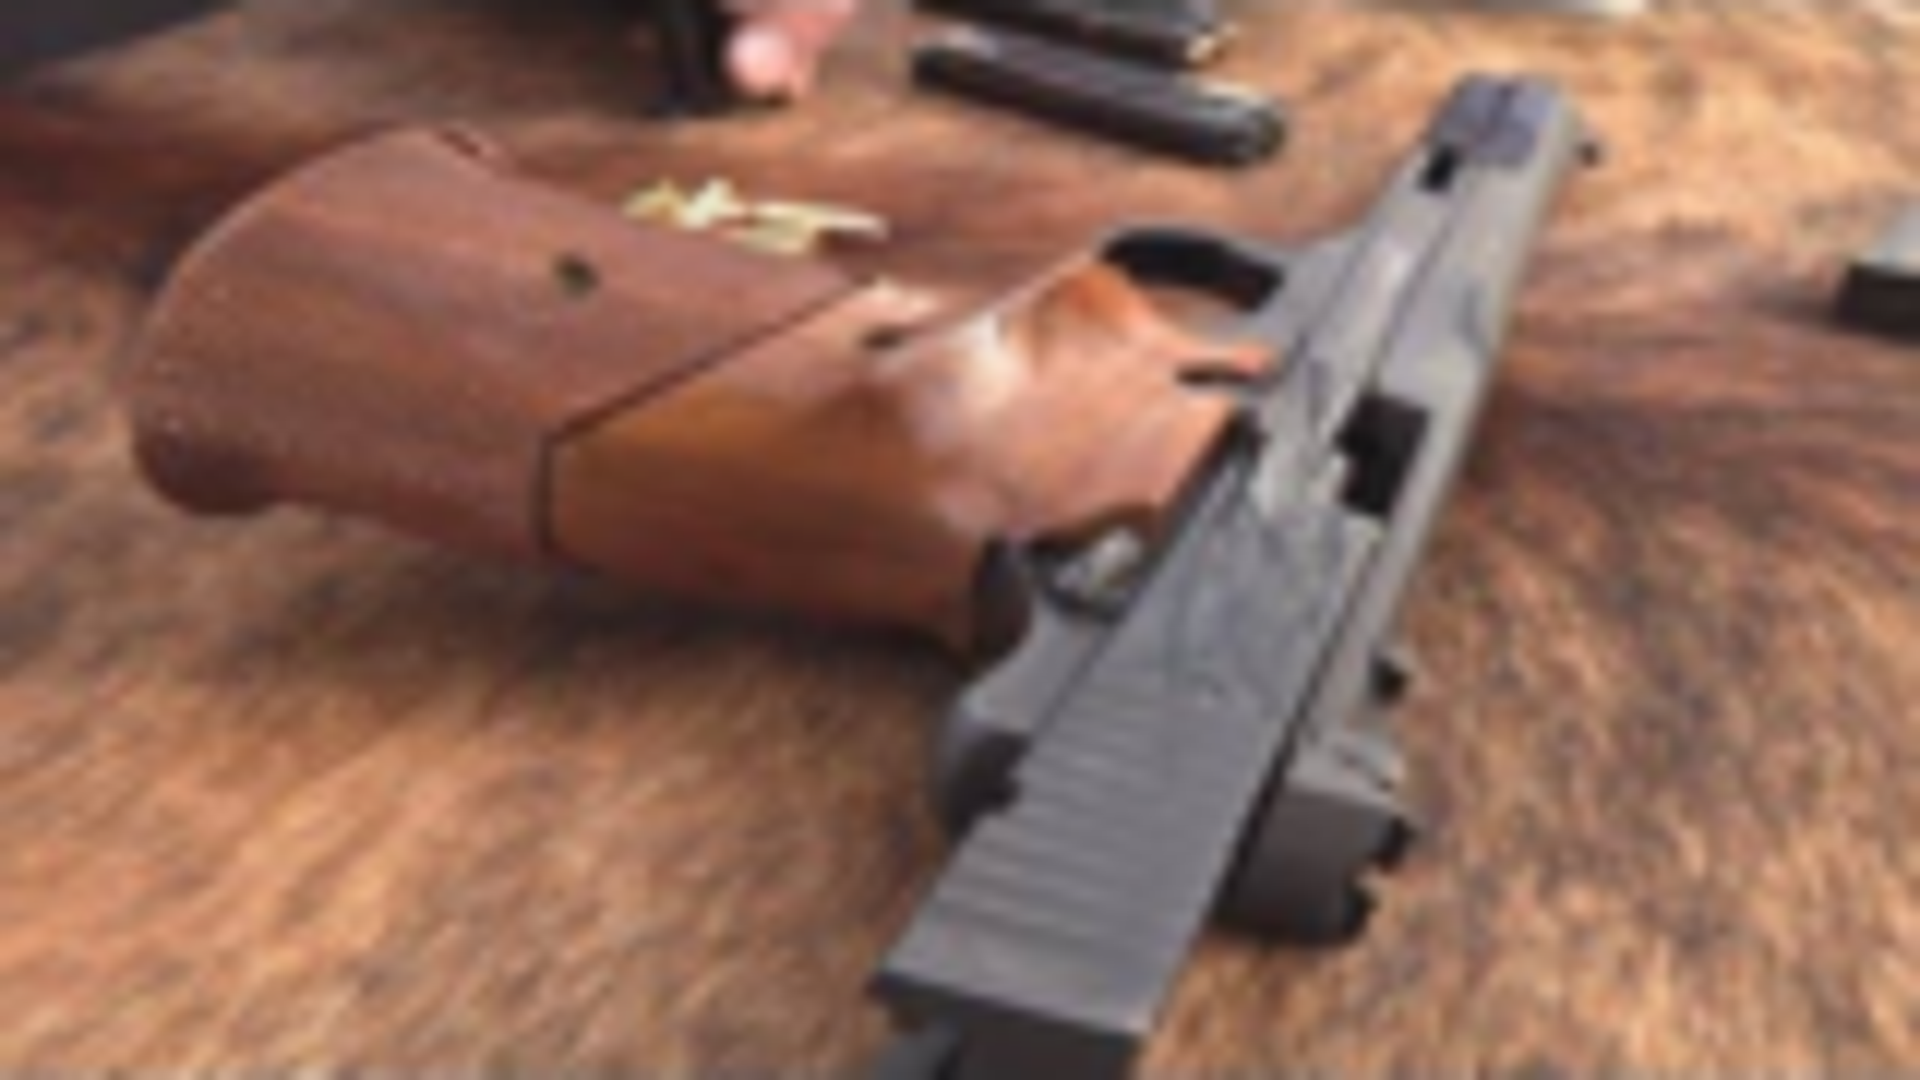 [hickok45]史密斯威森M41手枪30周年纪念款